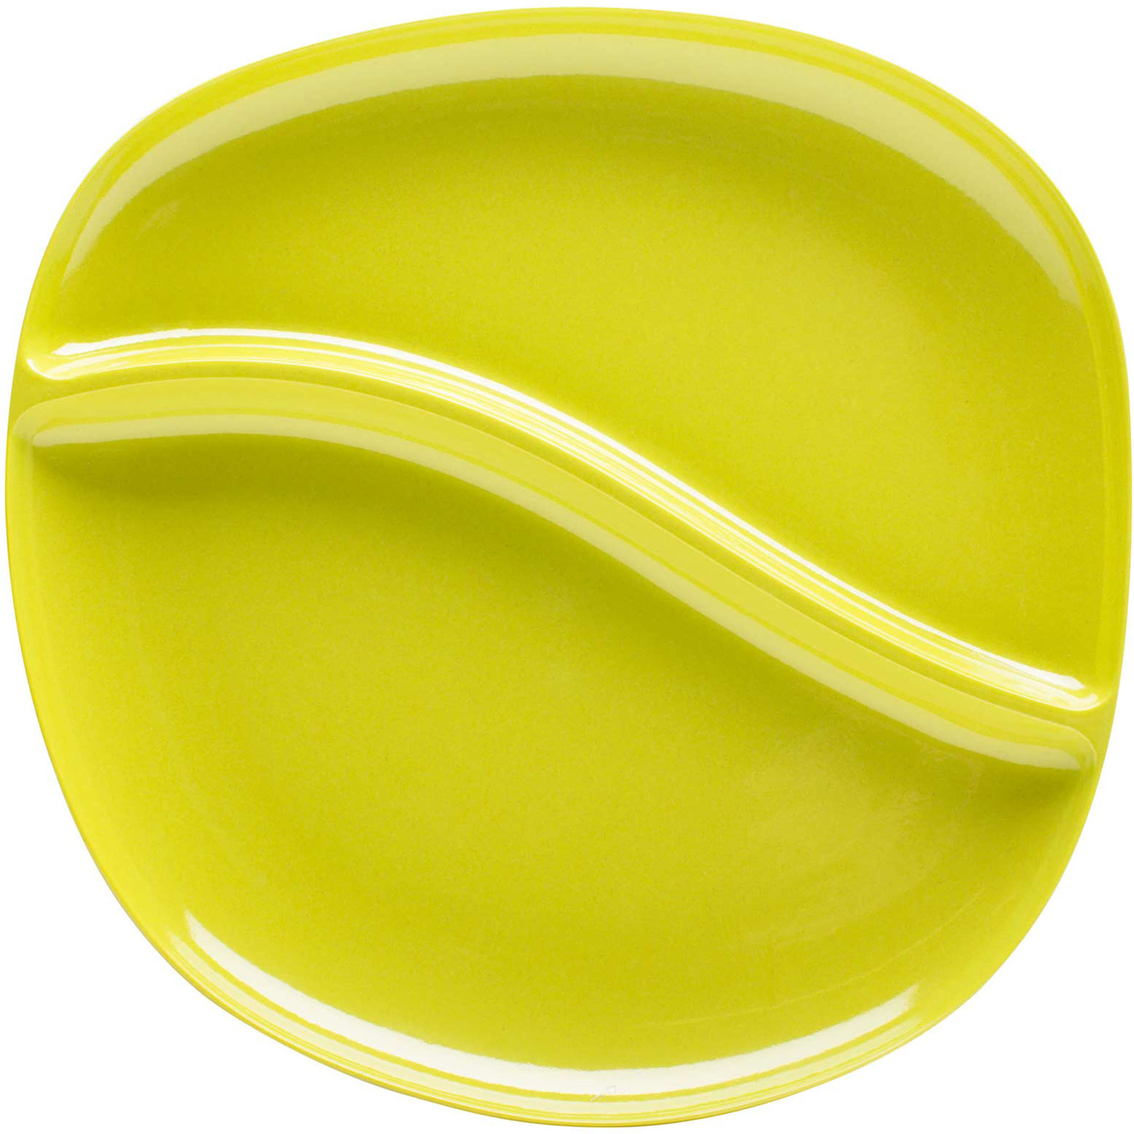 zak designs 10 in bamboo divided dinner plate plates home appliances shop the exchange. Black Bedroom Furniture Sets. Home Design Ideas